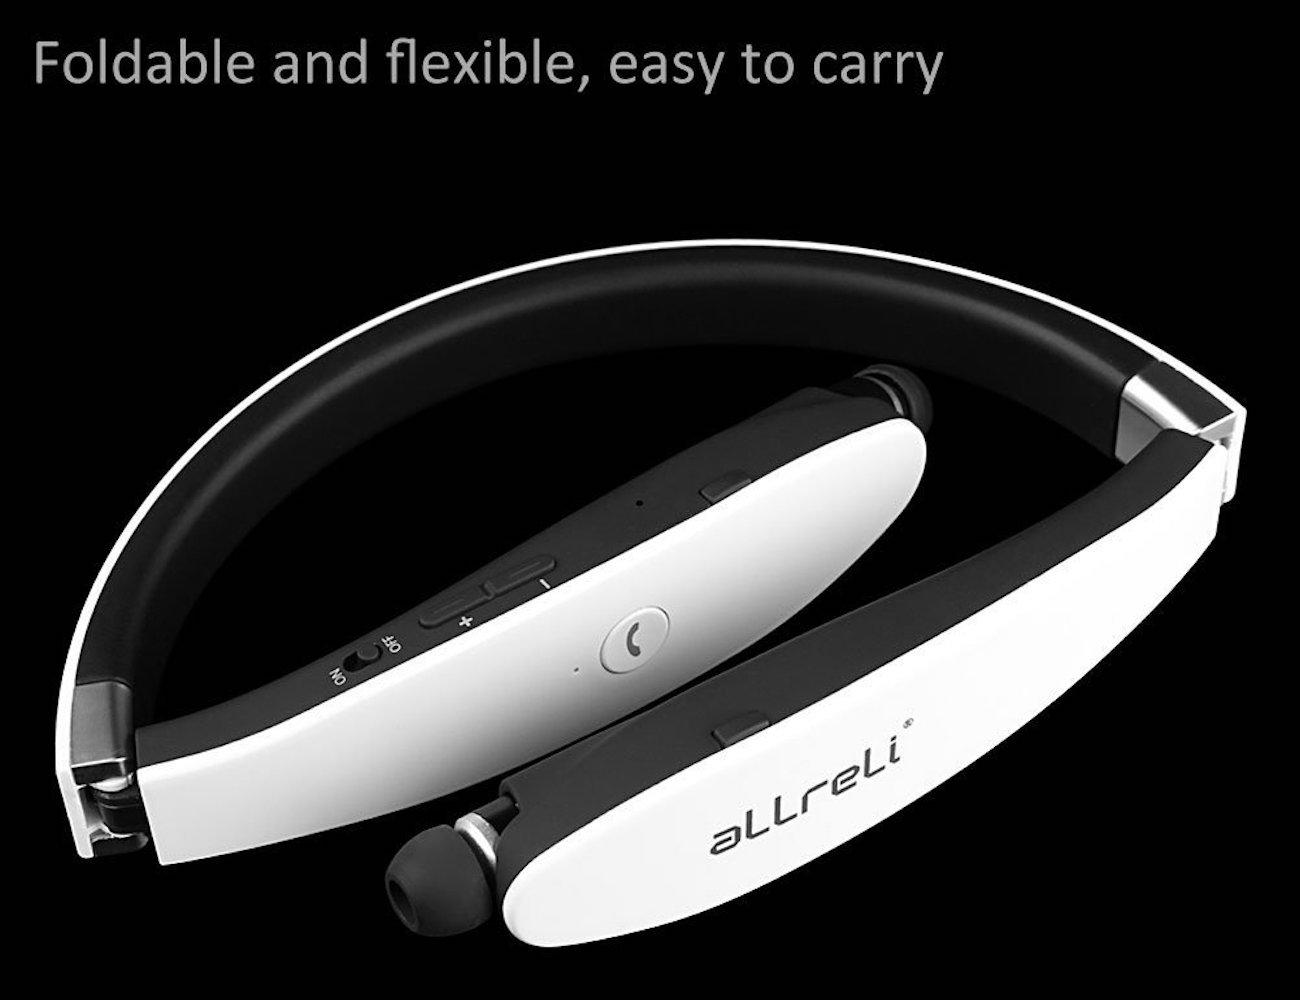 aLLreLi-Soba-Retractable-Speaker-4